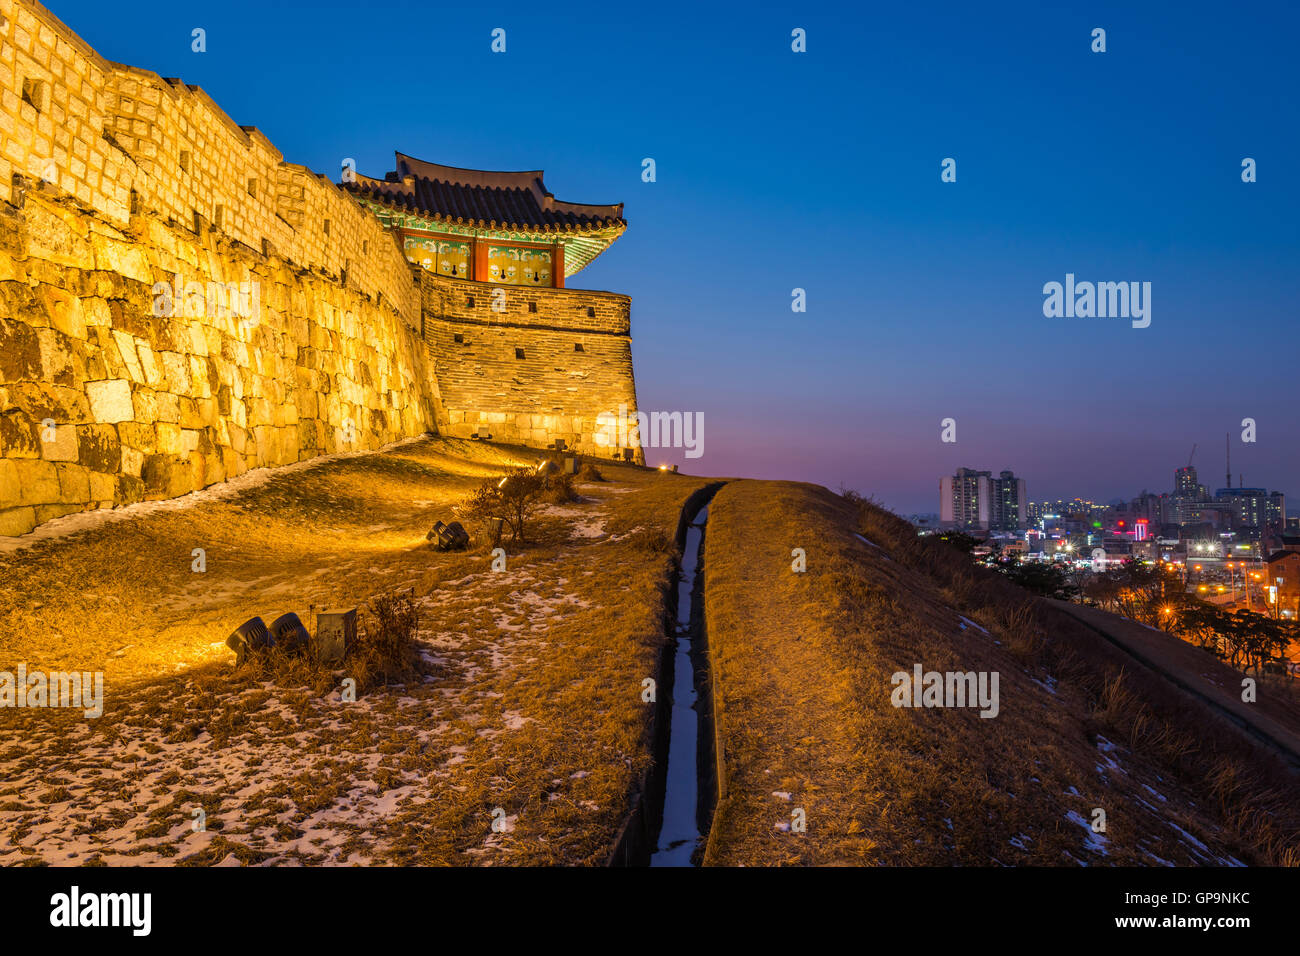 Korea,Sunset at Hwaseong Fortress in Suwon, South Korea. Stock Photo